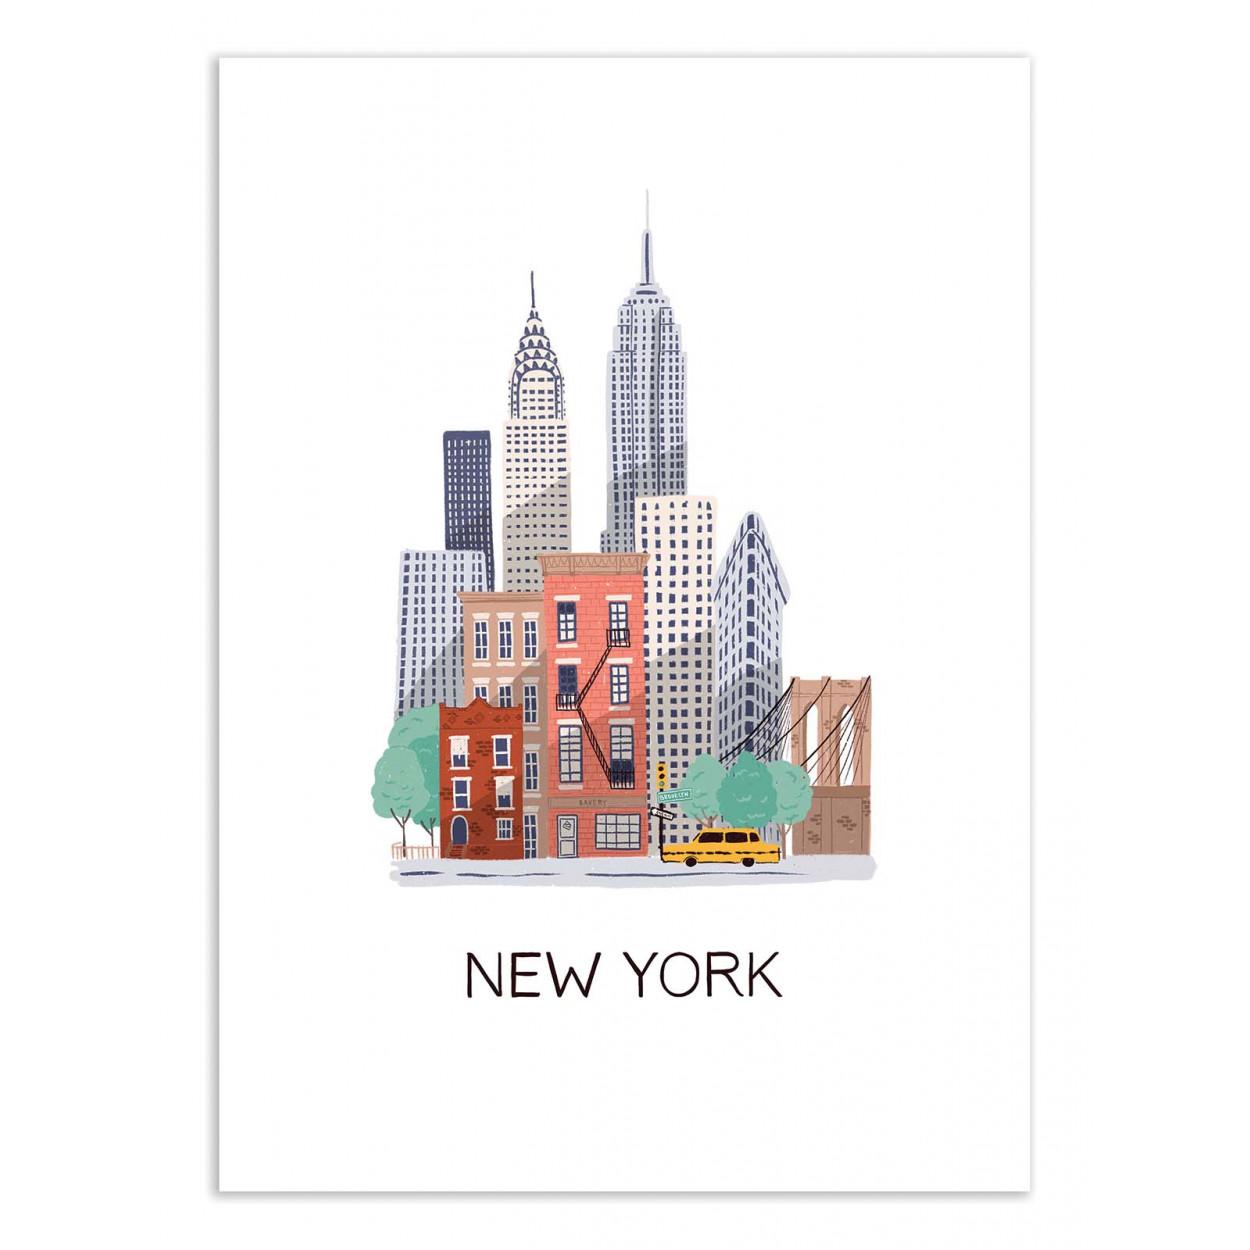 NEW YORK - MAJA TOMLJANIC -  Affiche d'art 50 x 70 cm